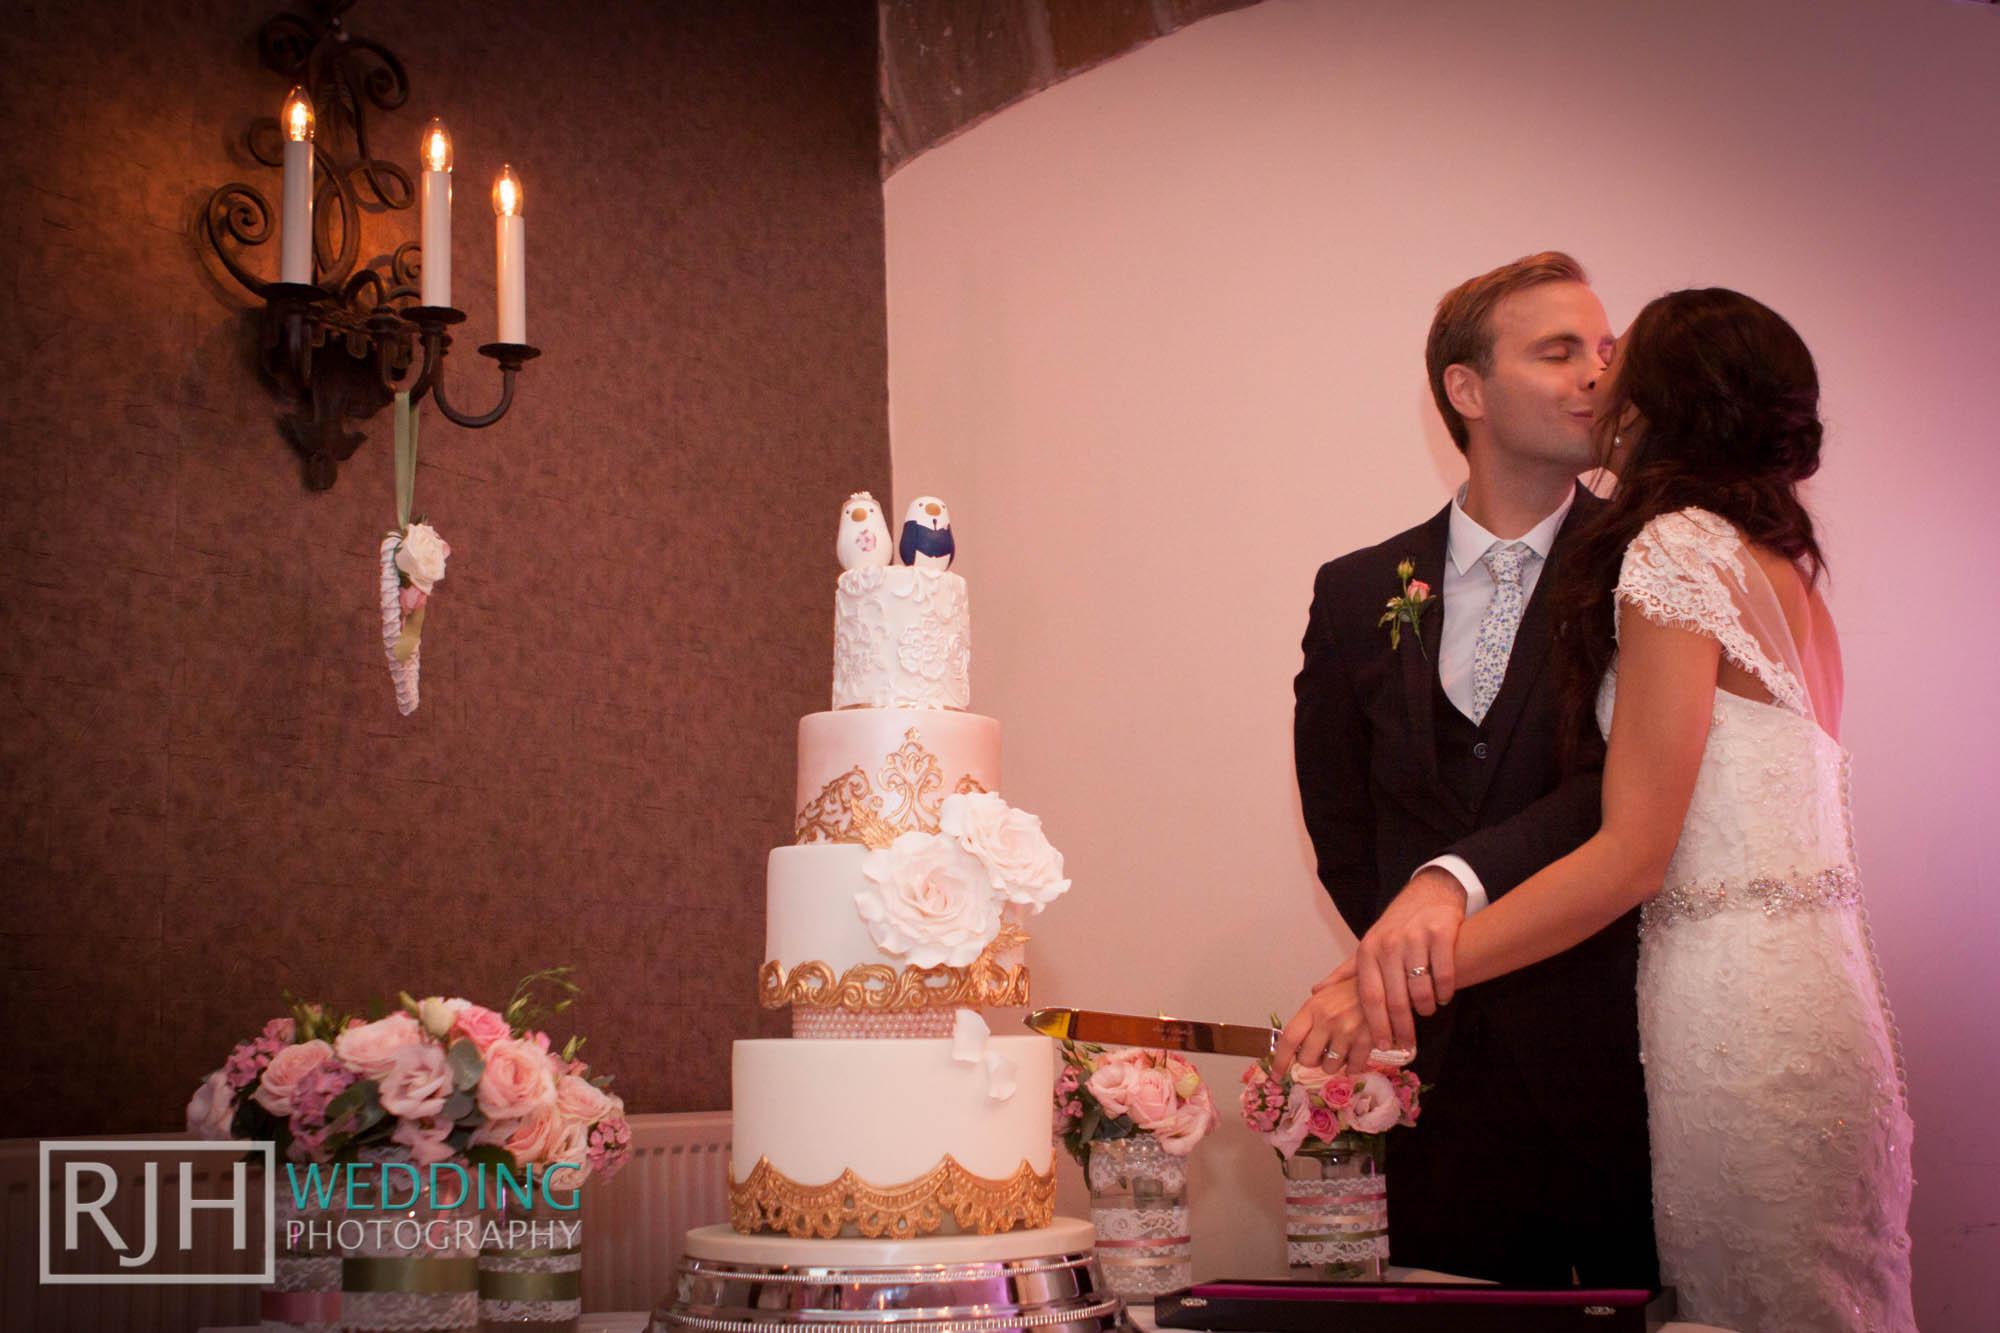 RJH Wedding Photography_Tankersley Manor Wedding_56.jpg